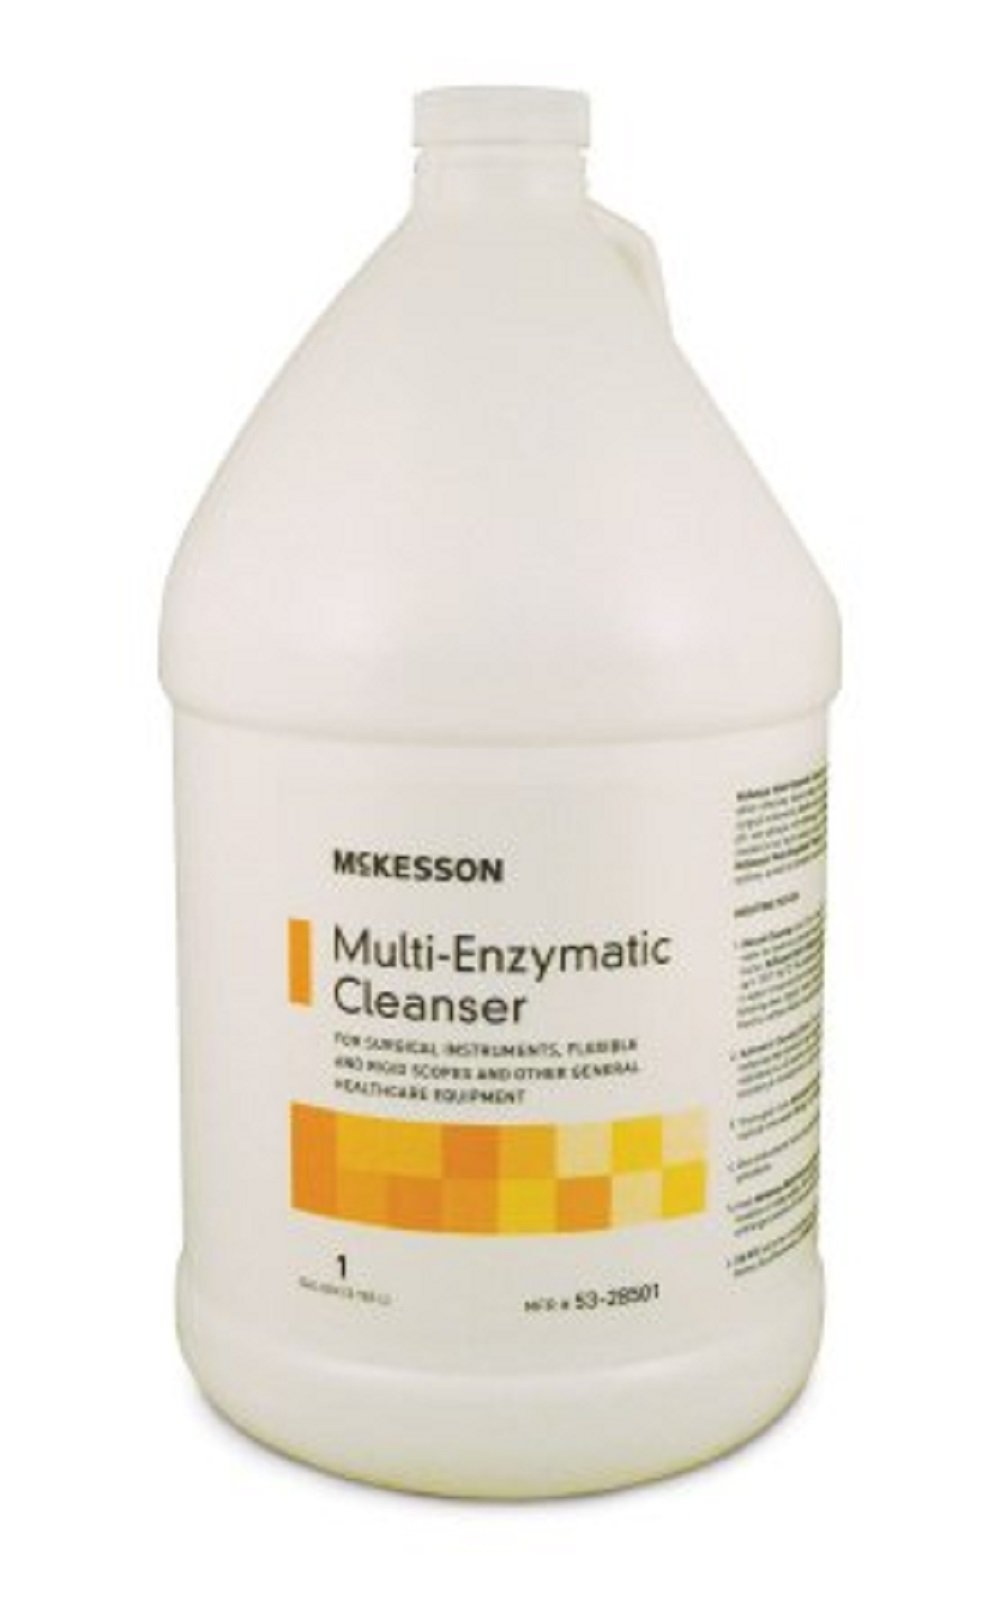 McKesson - Multi-Enzymatic Instrument Detergent - Liquid - 1 Gallon - Jug - Eucalyptus - Spearmint Scent - 4/Case